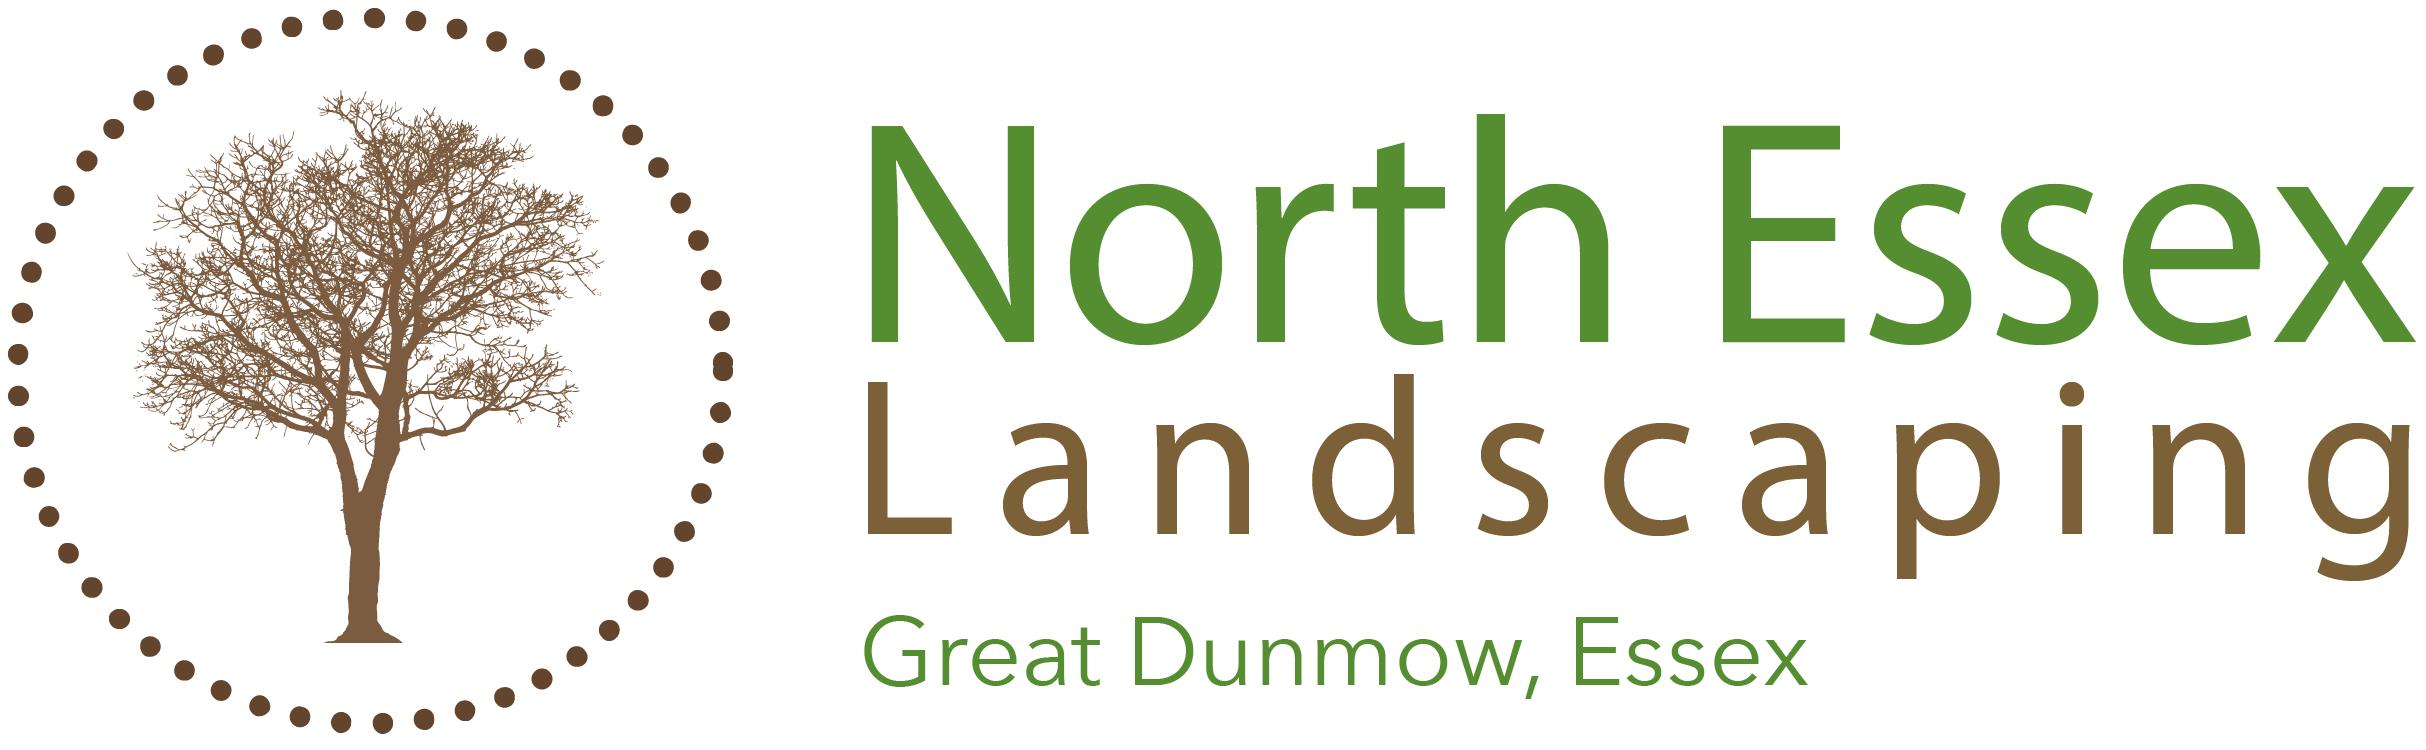 North Essex Landscaping_Great Dunmow_Essex logo